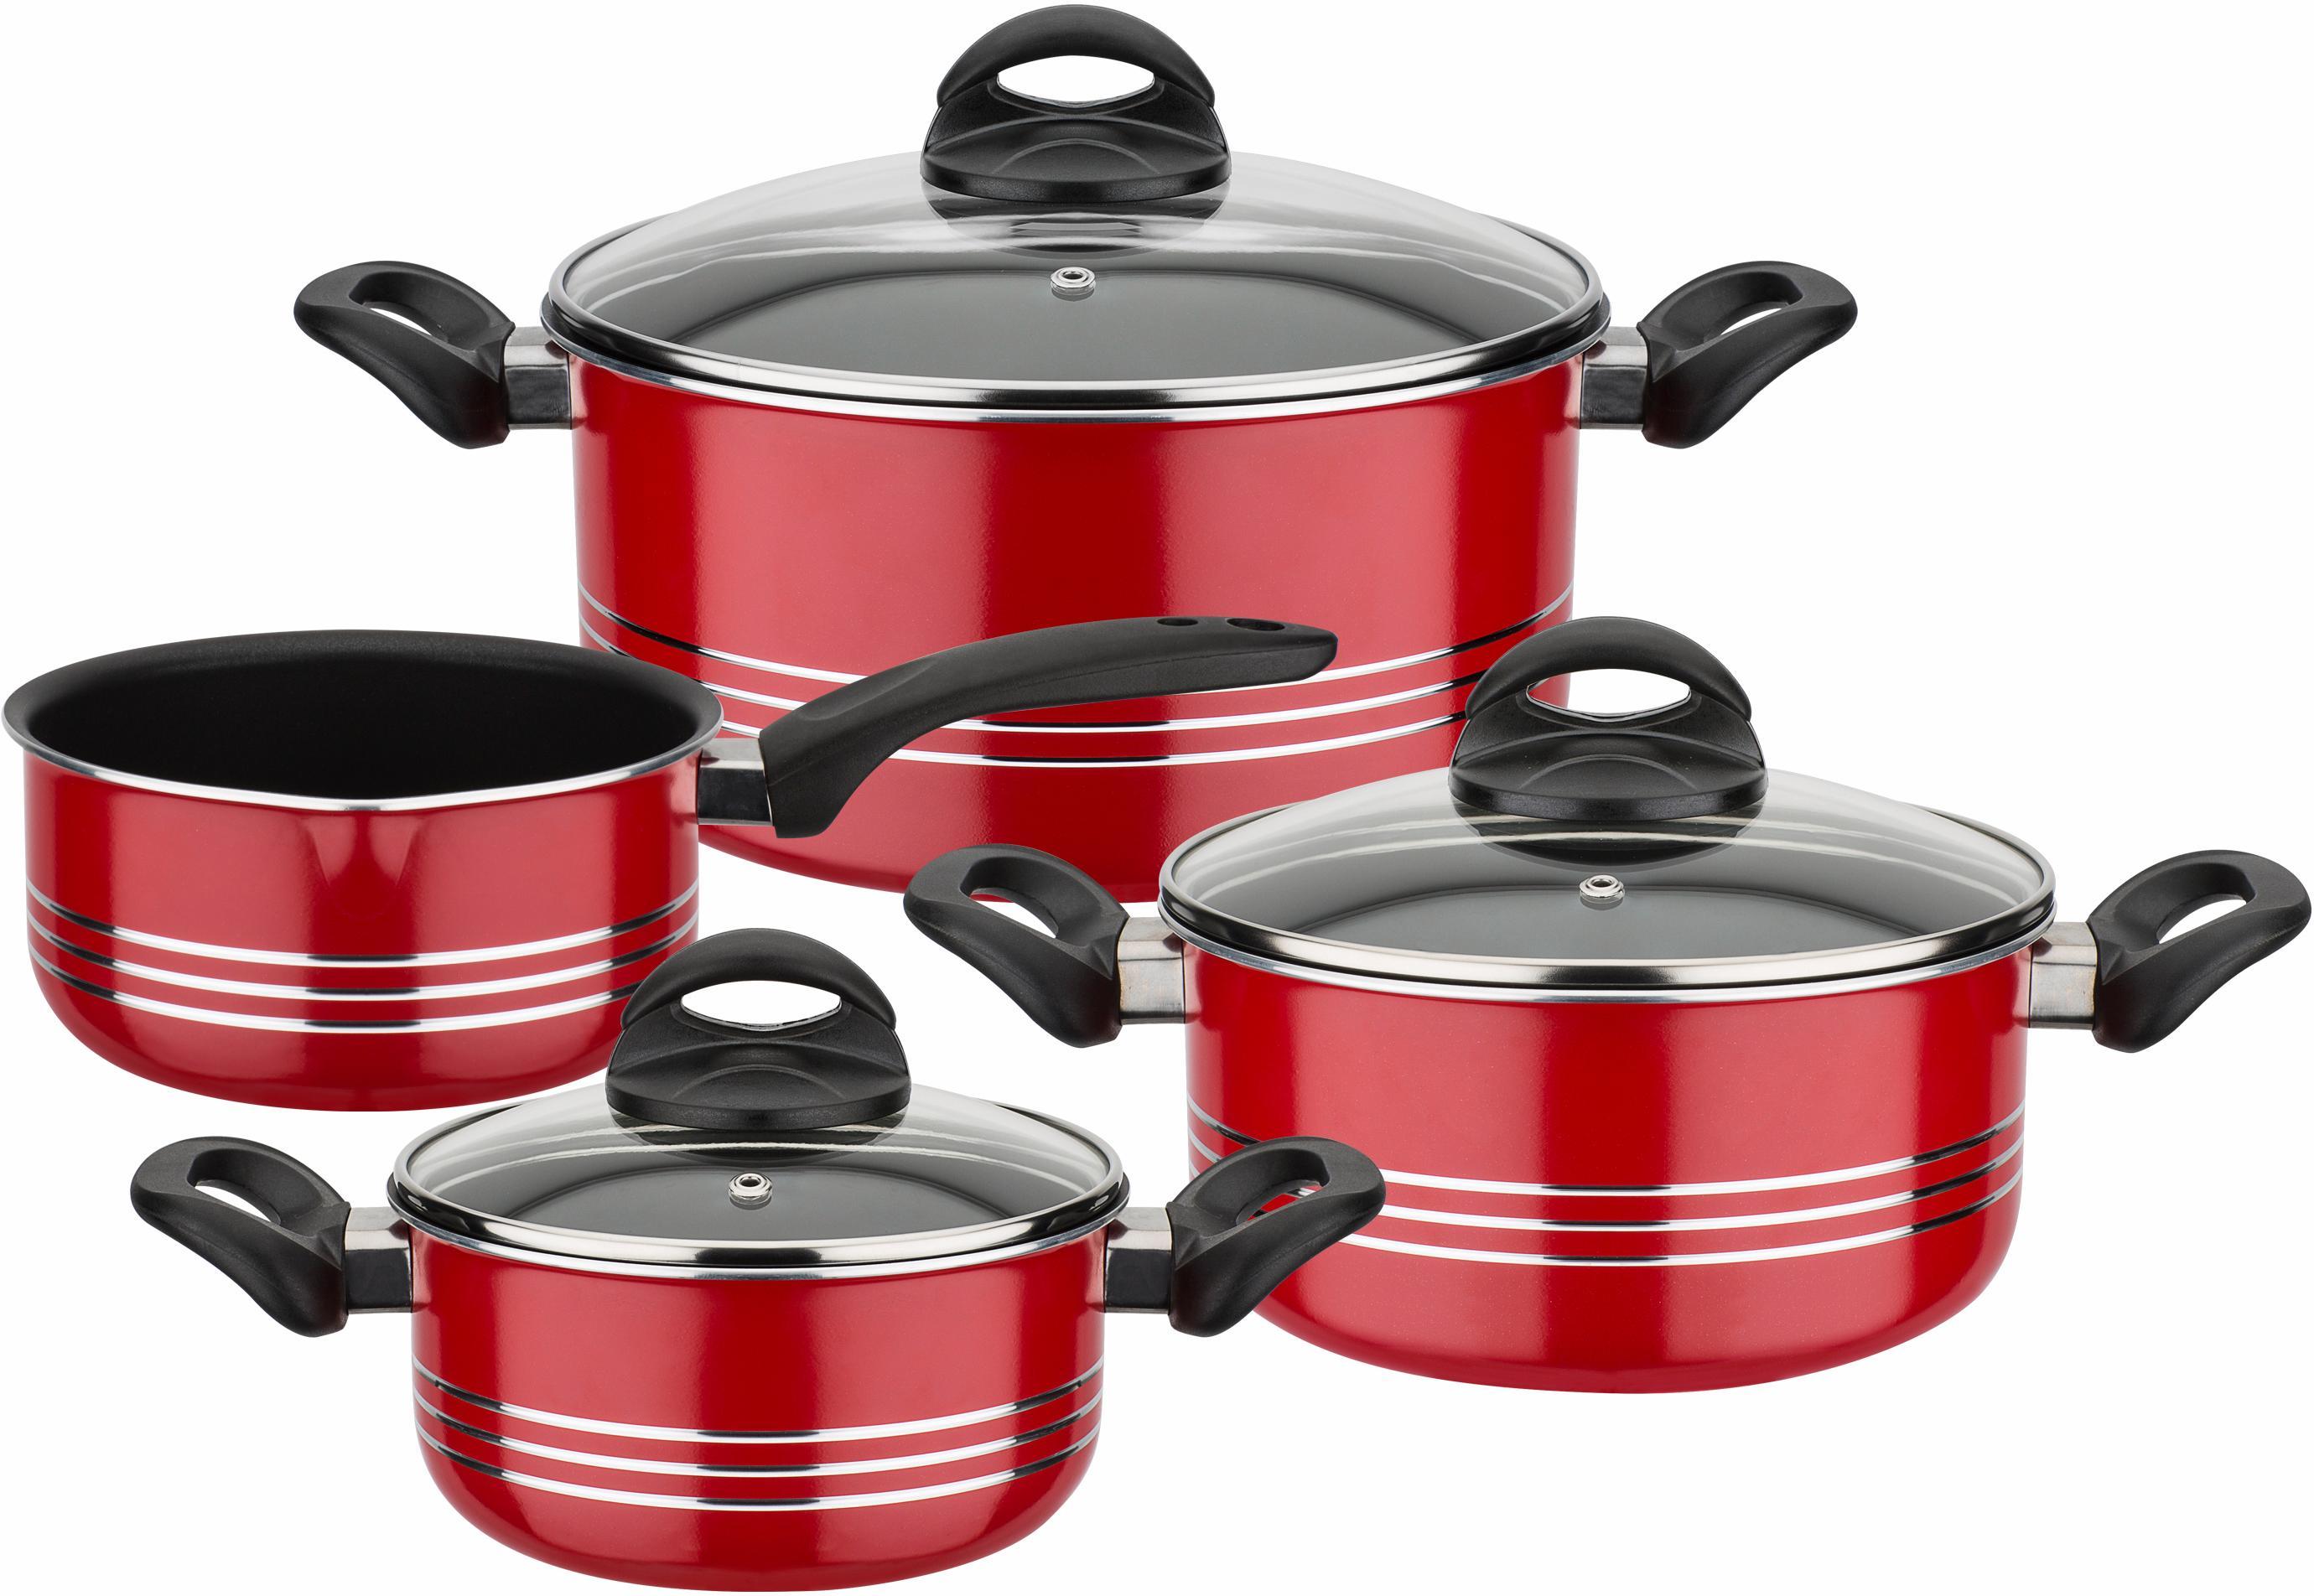 GSW Topf-Set Milano Color, Leichtmetall-Legierung, (Set, 7 tlg.), Induktion rot Topfsets Töpfe Haushaltswaren Topf